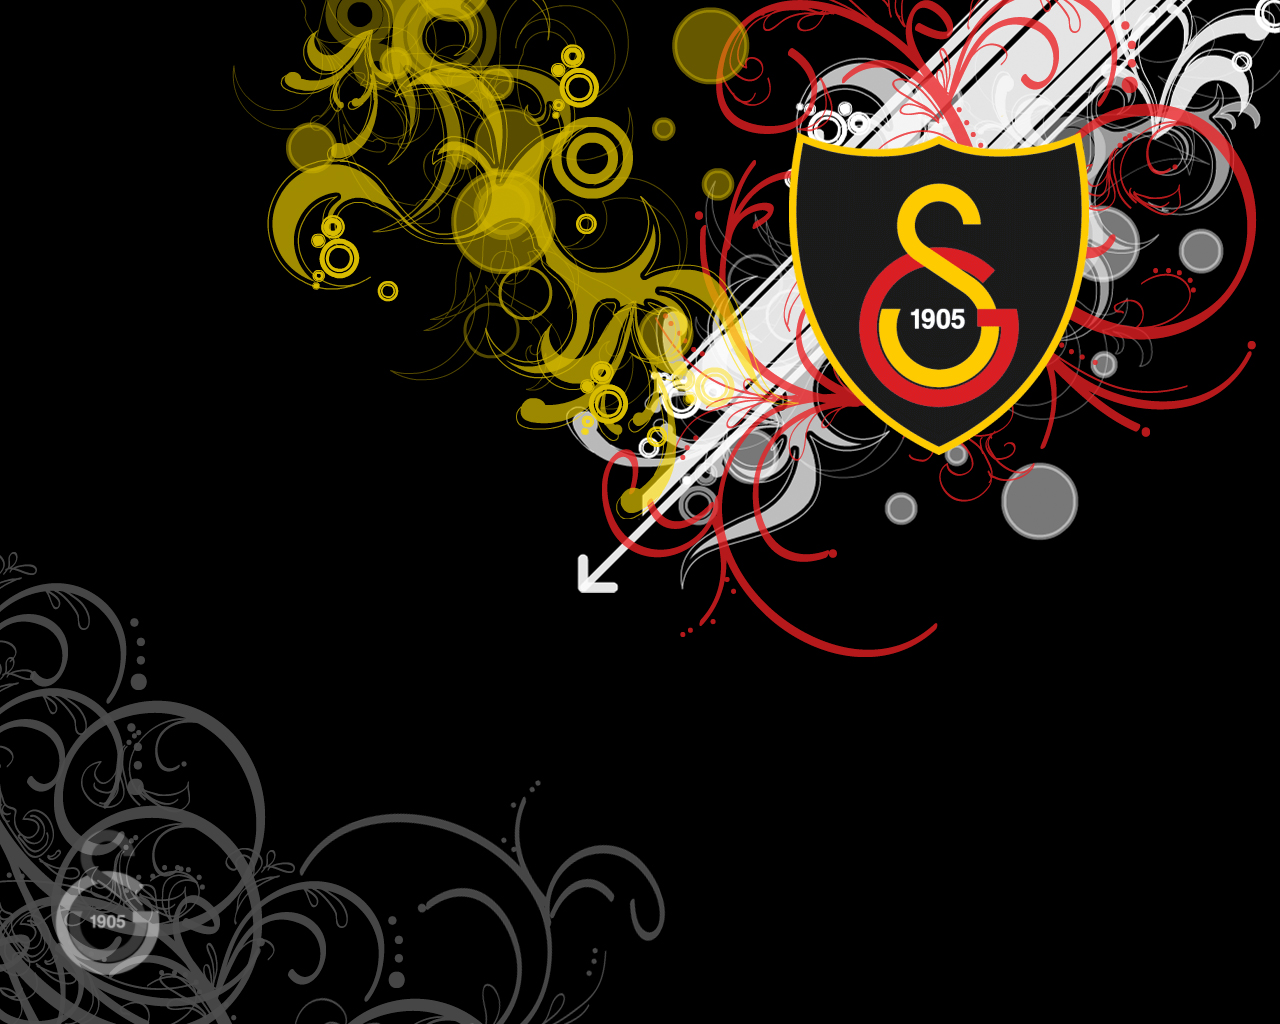 http://3.bp.blogspot.com/-95Lk1MCHDRw/T_sngol0LTI/AAAAAAAAC3A/O1P5laGVEEI/s1600/gs-duvar-kag%C4%B1d%C4%B1-galatasaray-resimleri-gs-wallpaper-galatasaray-logo-en-g%C3%BCzel-gs-resimleri-galatasaray-duvar-ka%C4%9F%C4%B1tlar%C4%B1-galatasaray-amblem-g%C3%BCzel.jpg